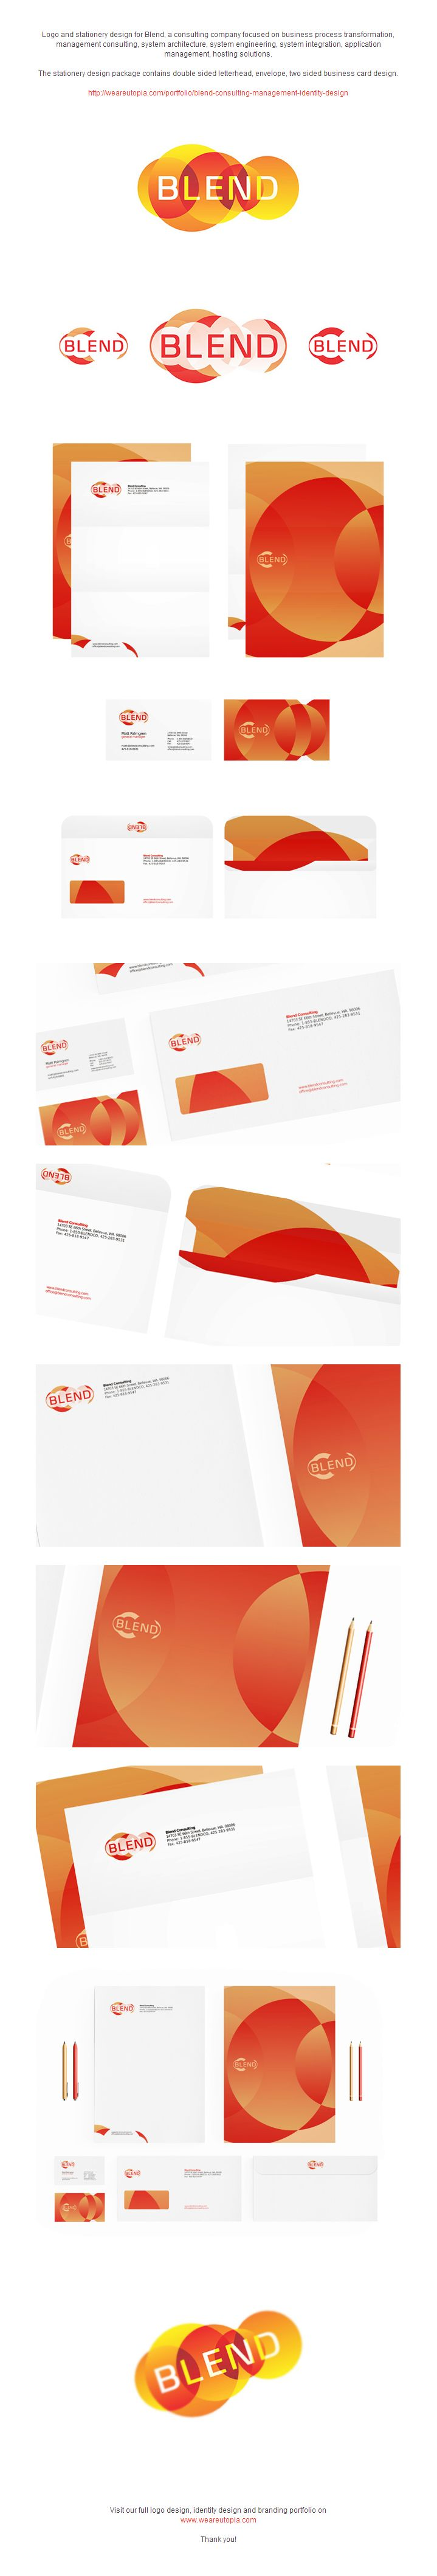 Cassandra cappello graphic design toronto - Find This Pin And More On Graphic Design